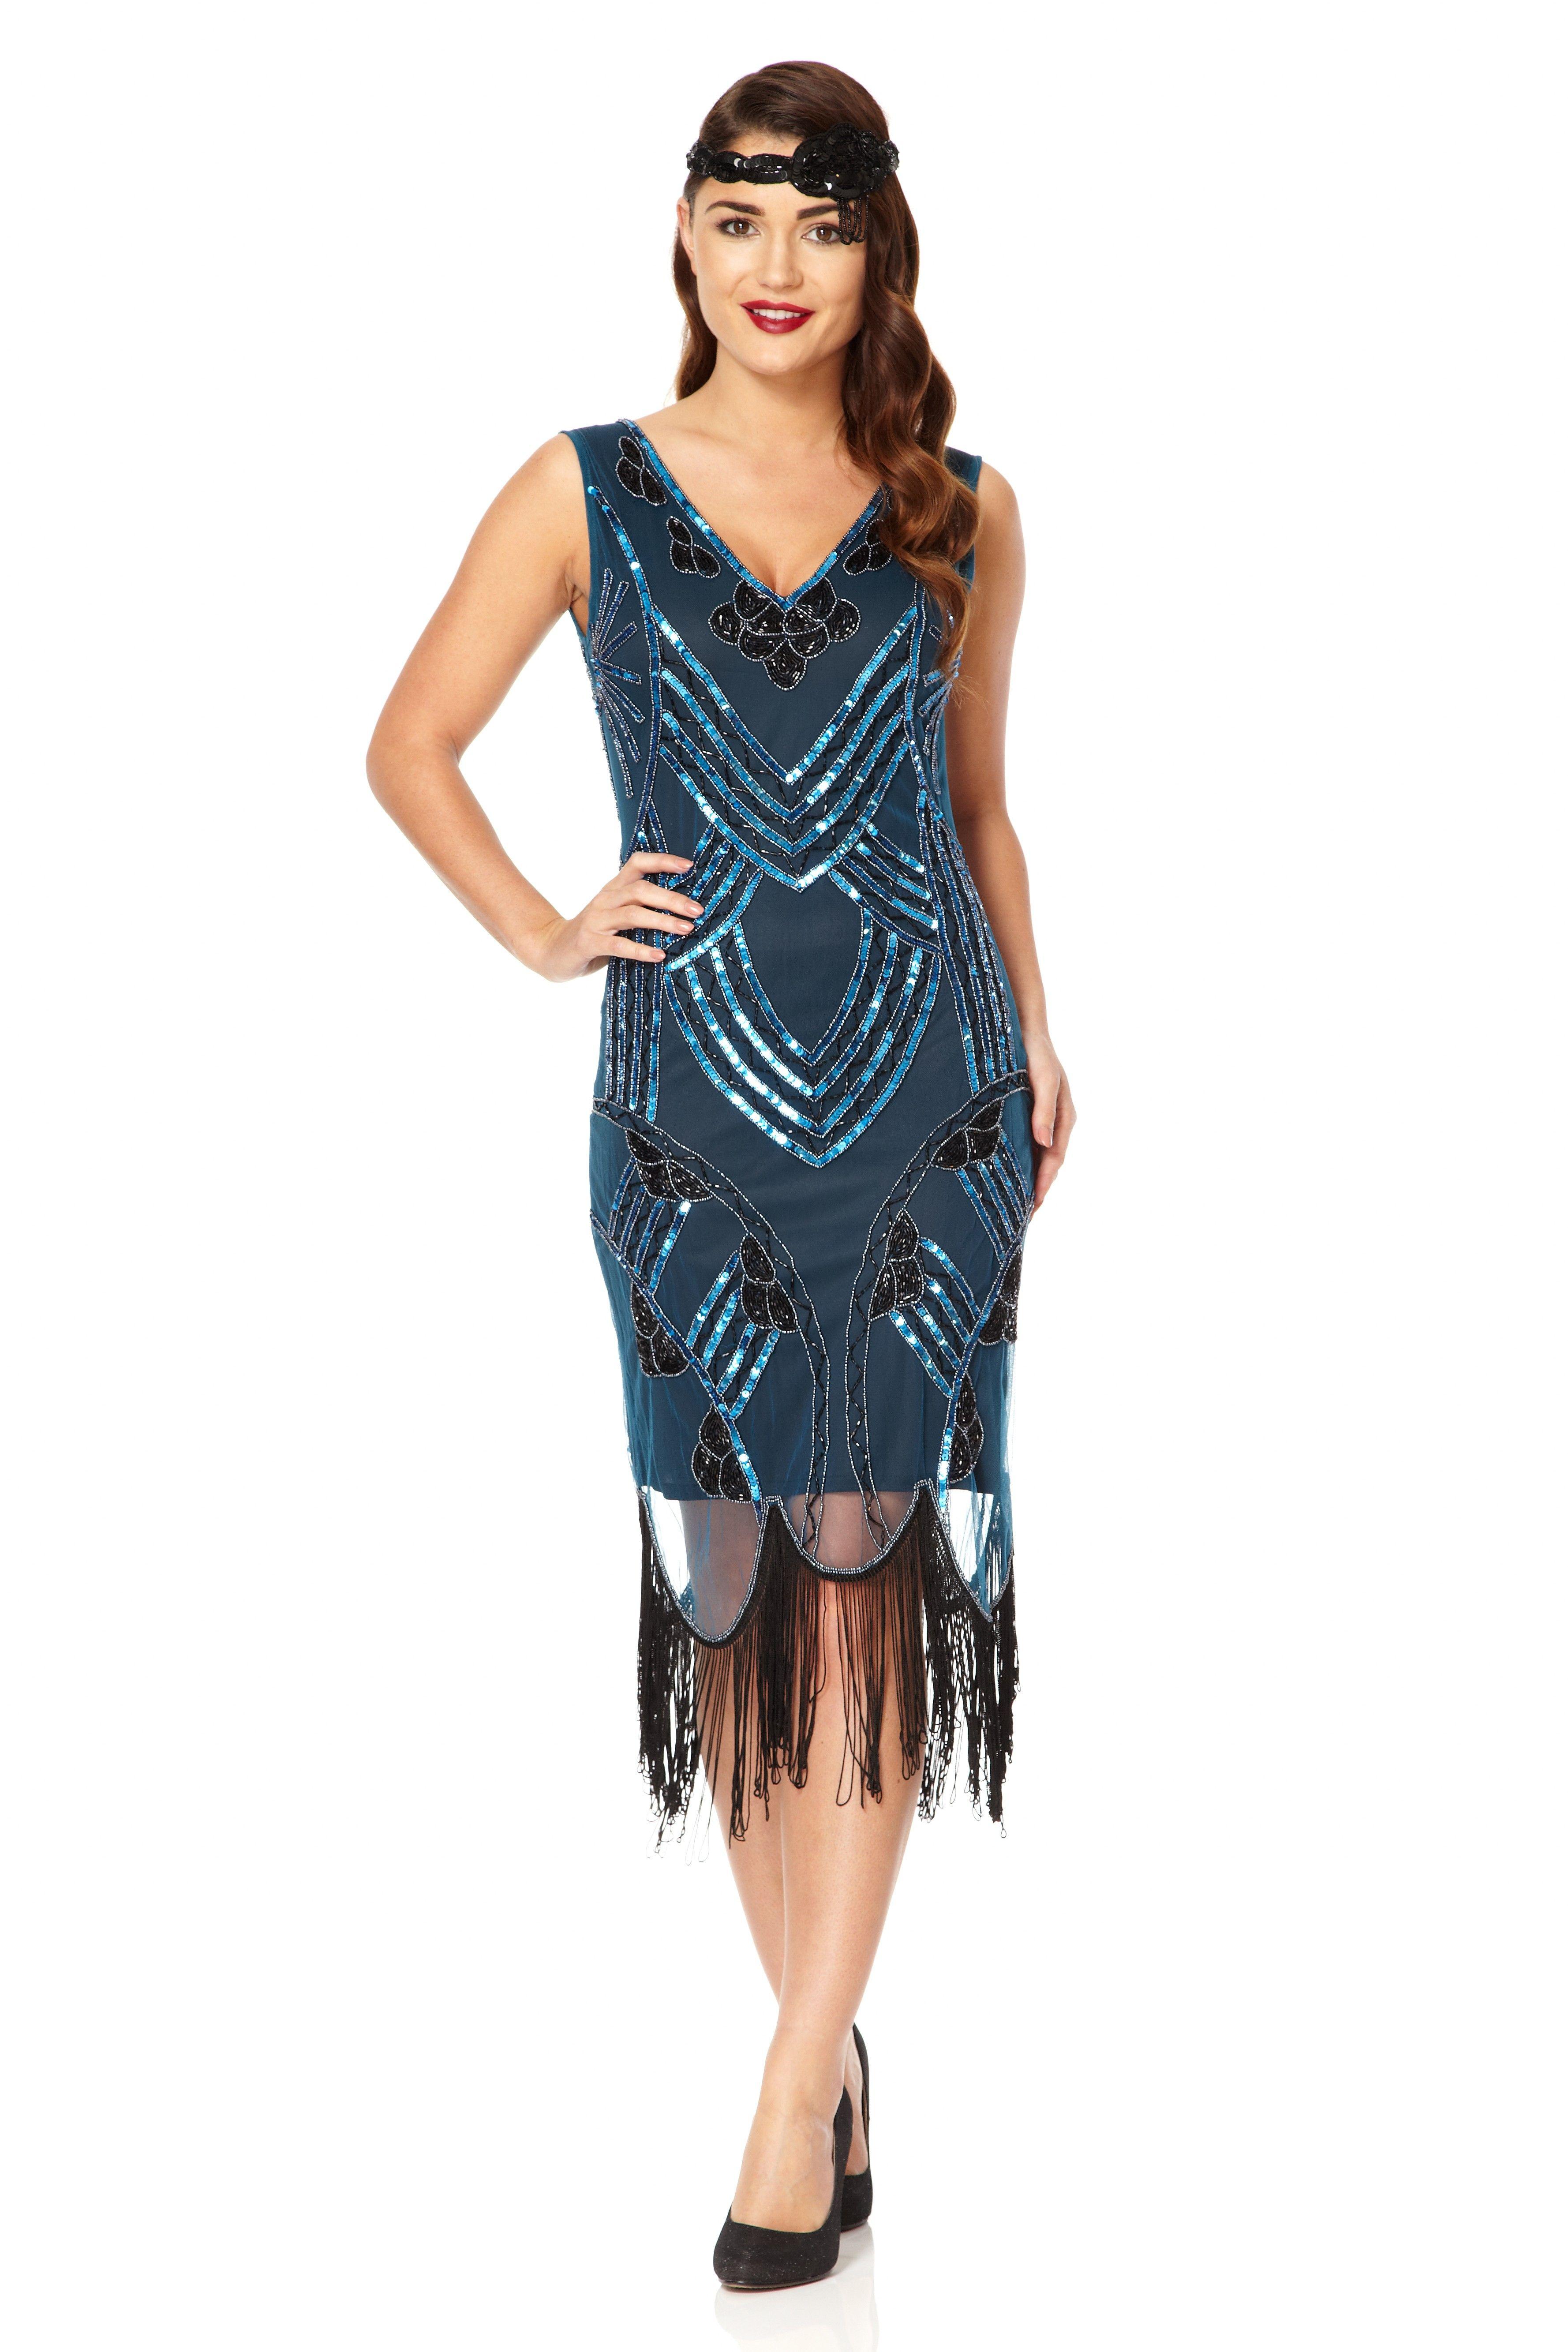 Gatsbylady juliet us vintage fringe dress costuming